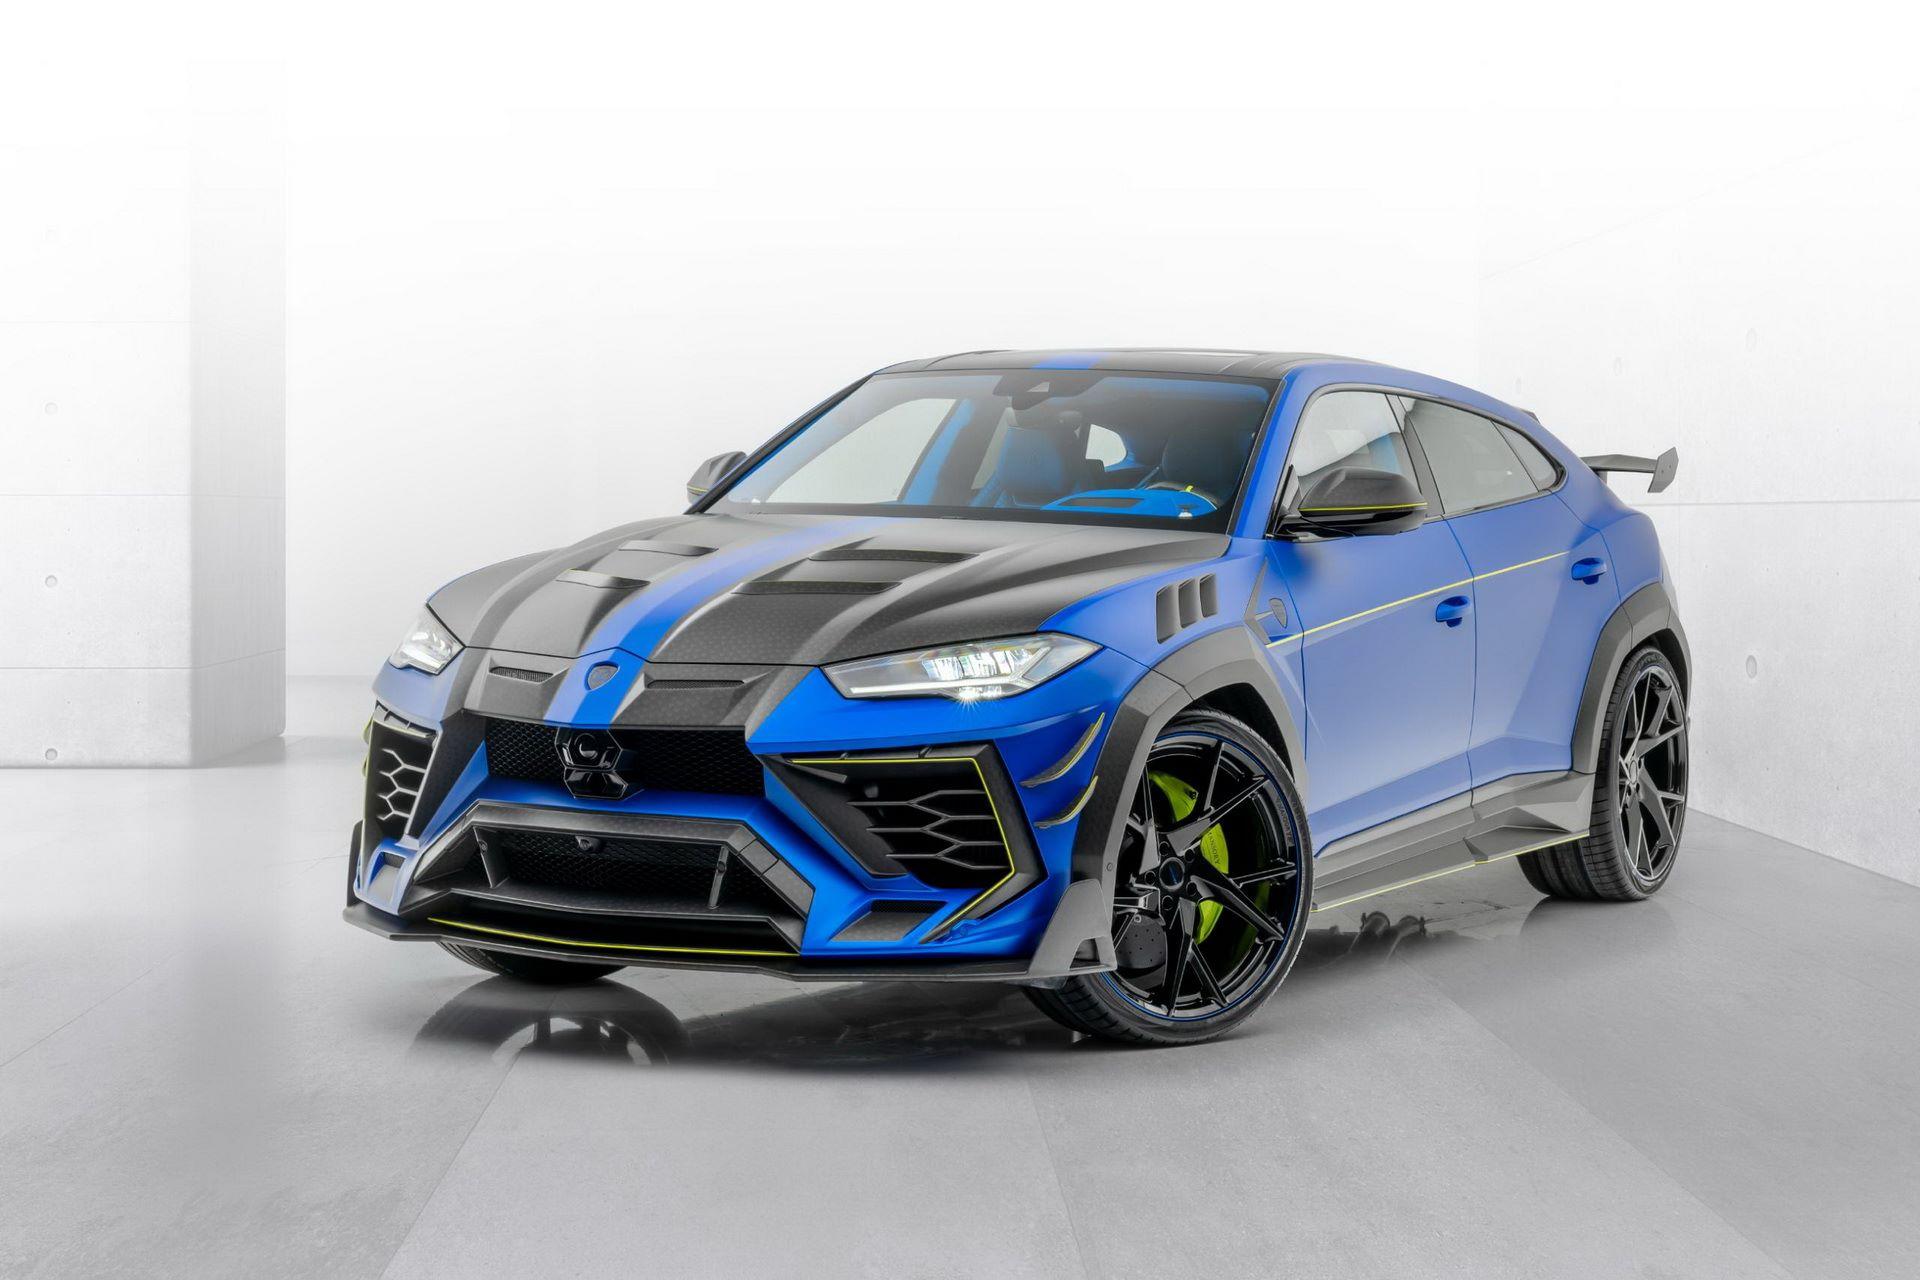 Lamborghini-Urus-Mansory-Venatus-1